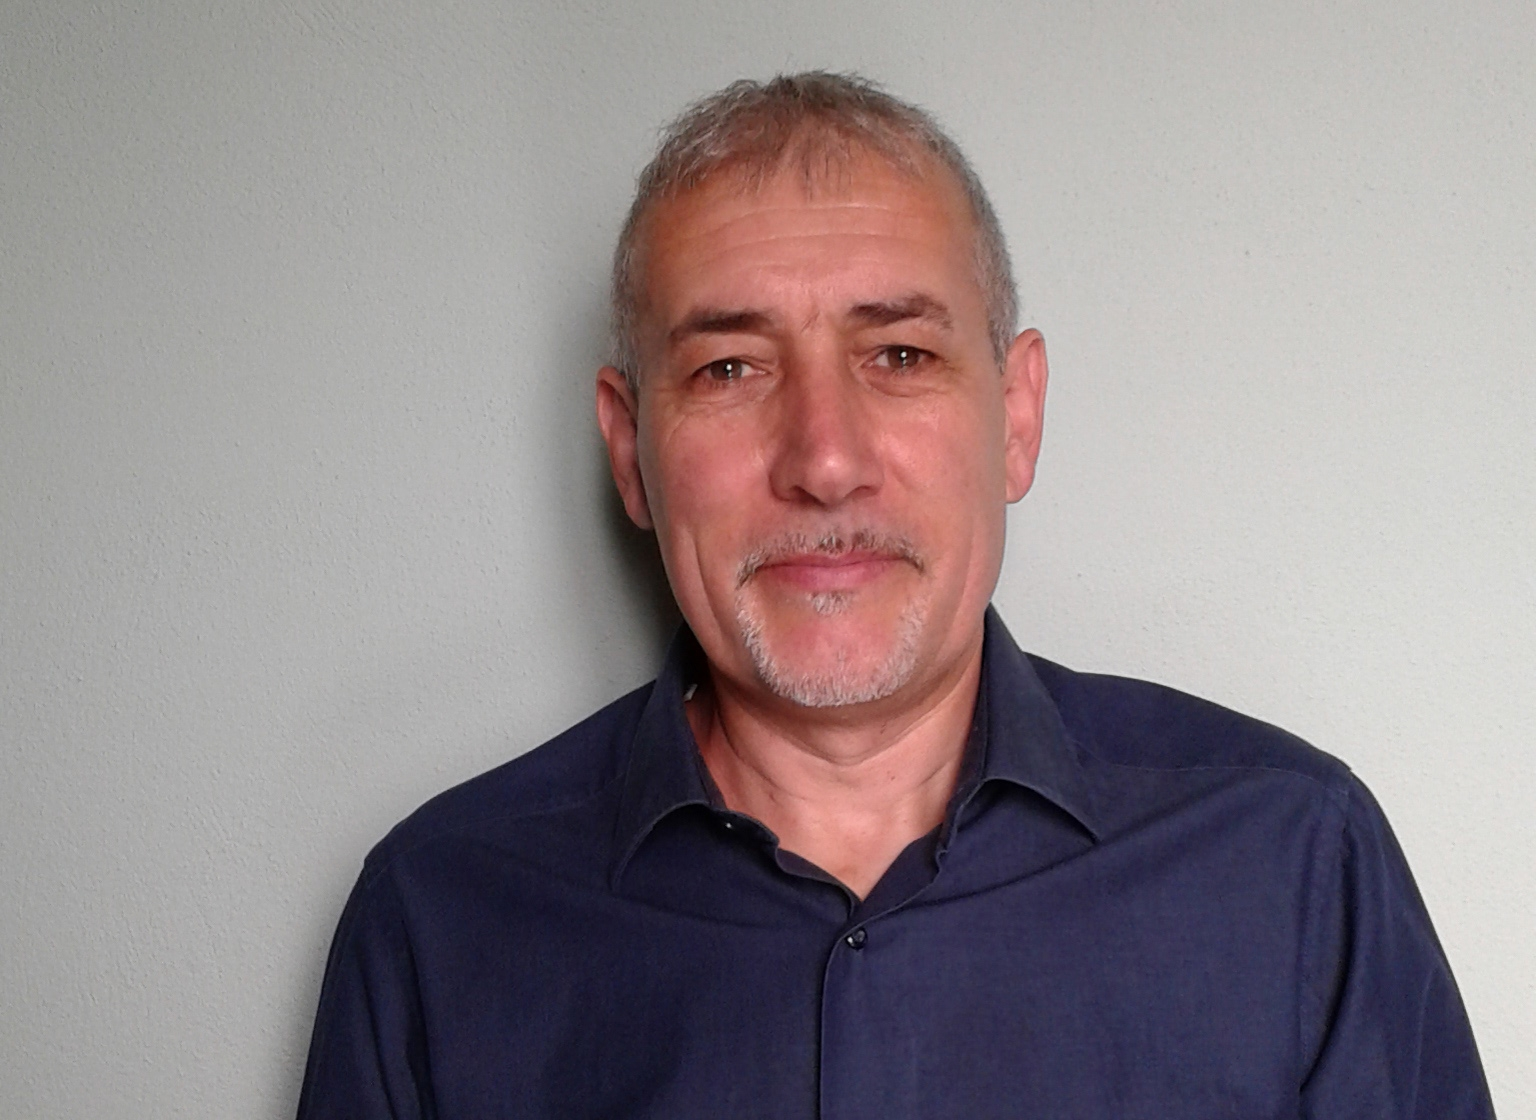 Roberto Passarotto